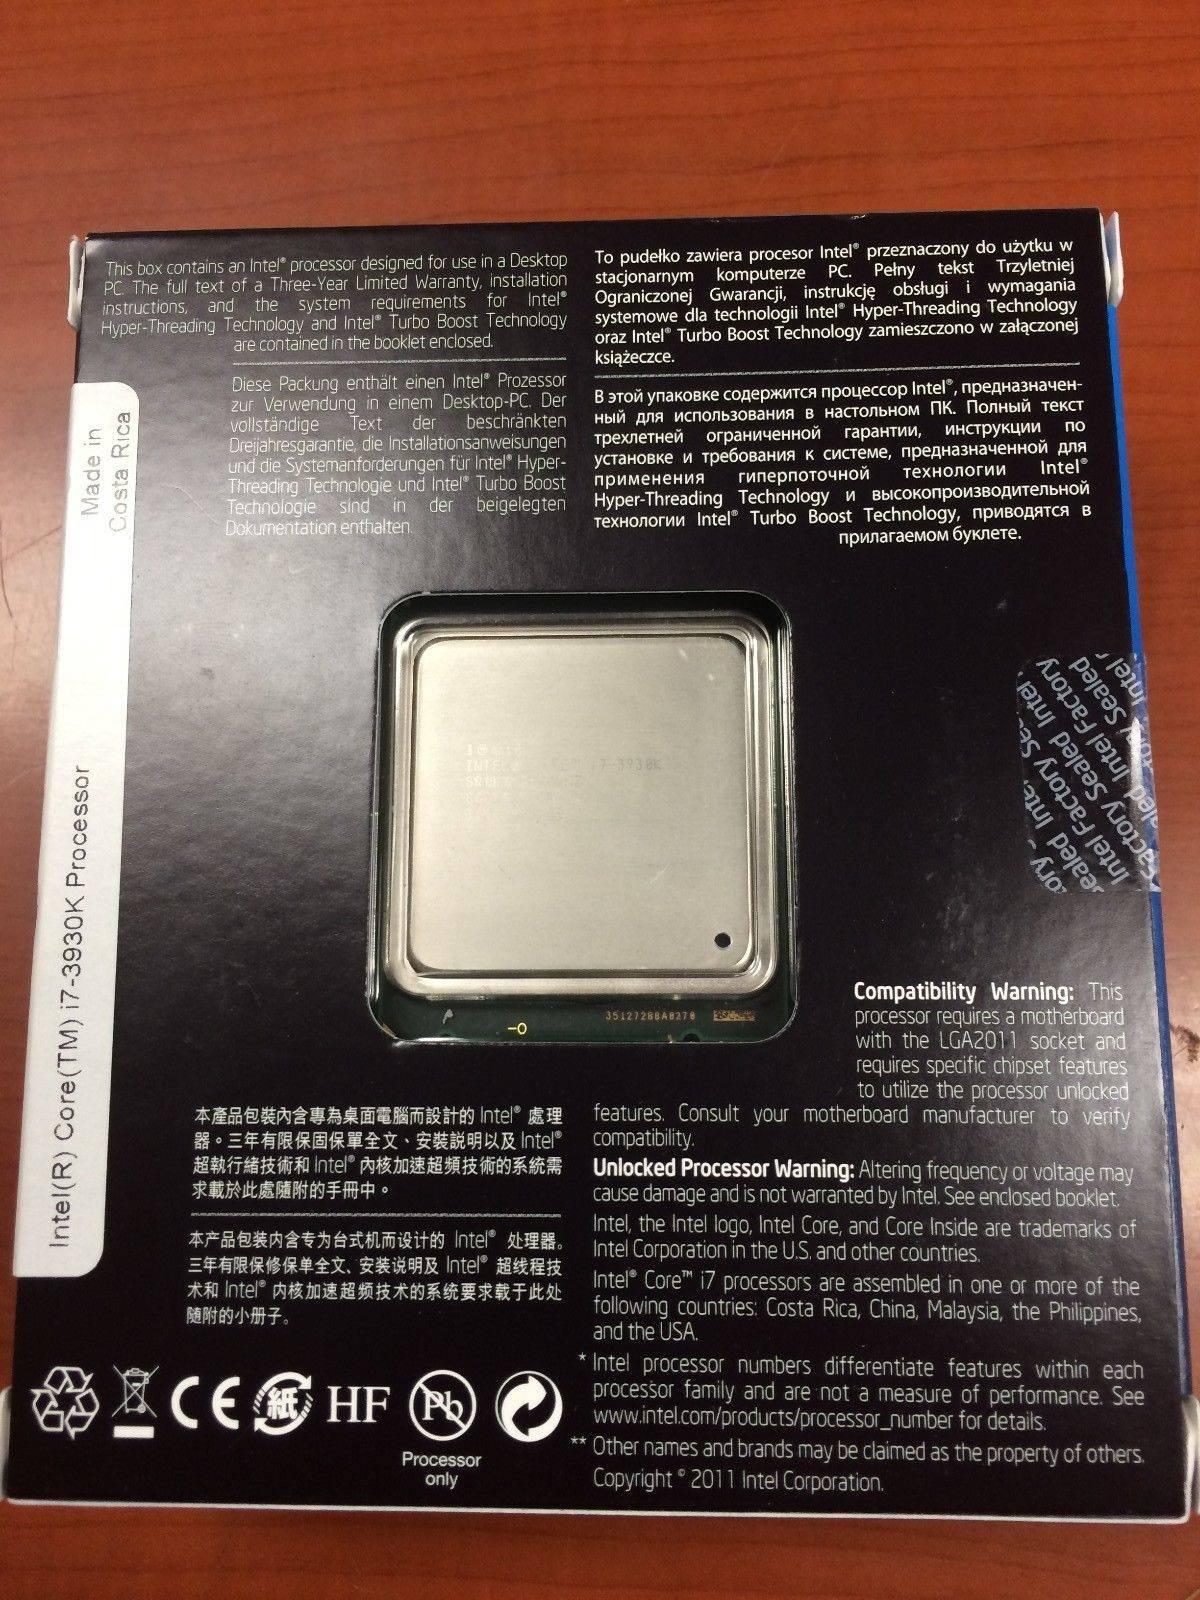 Intel Core i7-6950X 3.0GHz LGA 2011-3 Intel Processor Extreme